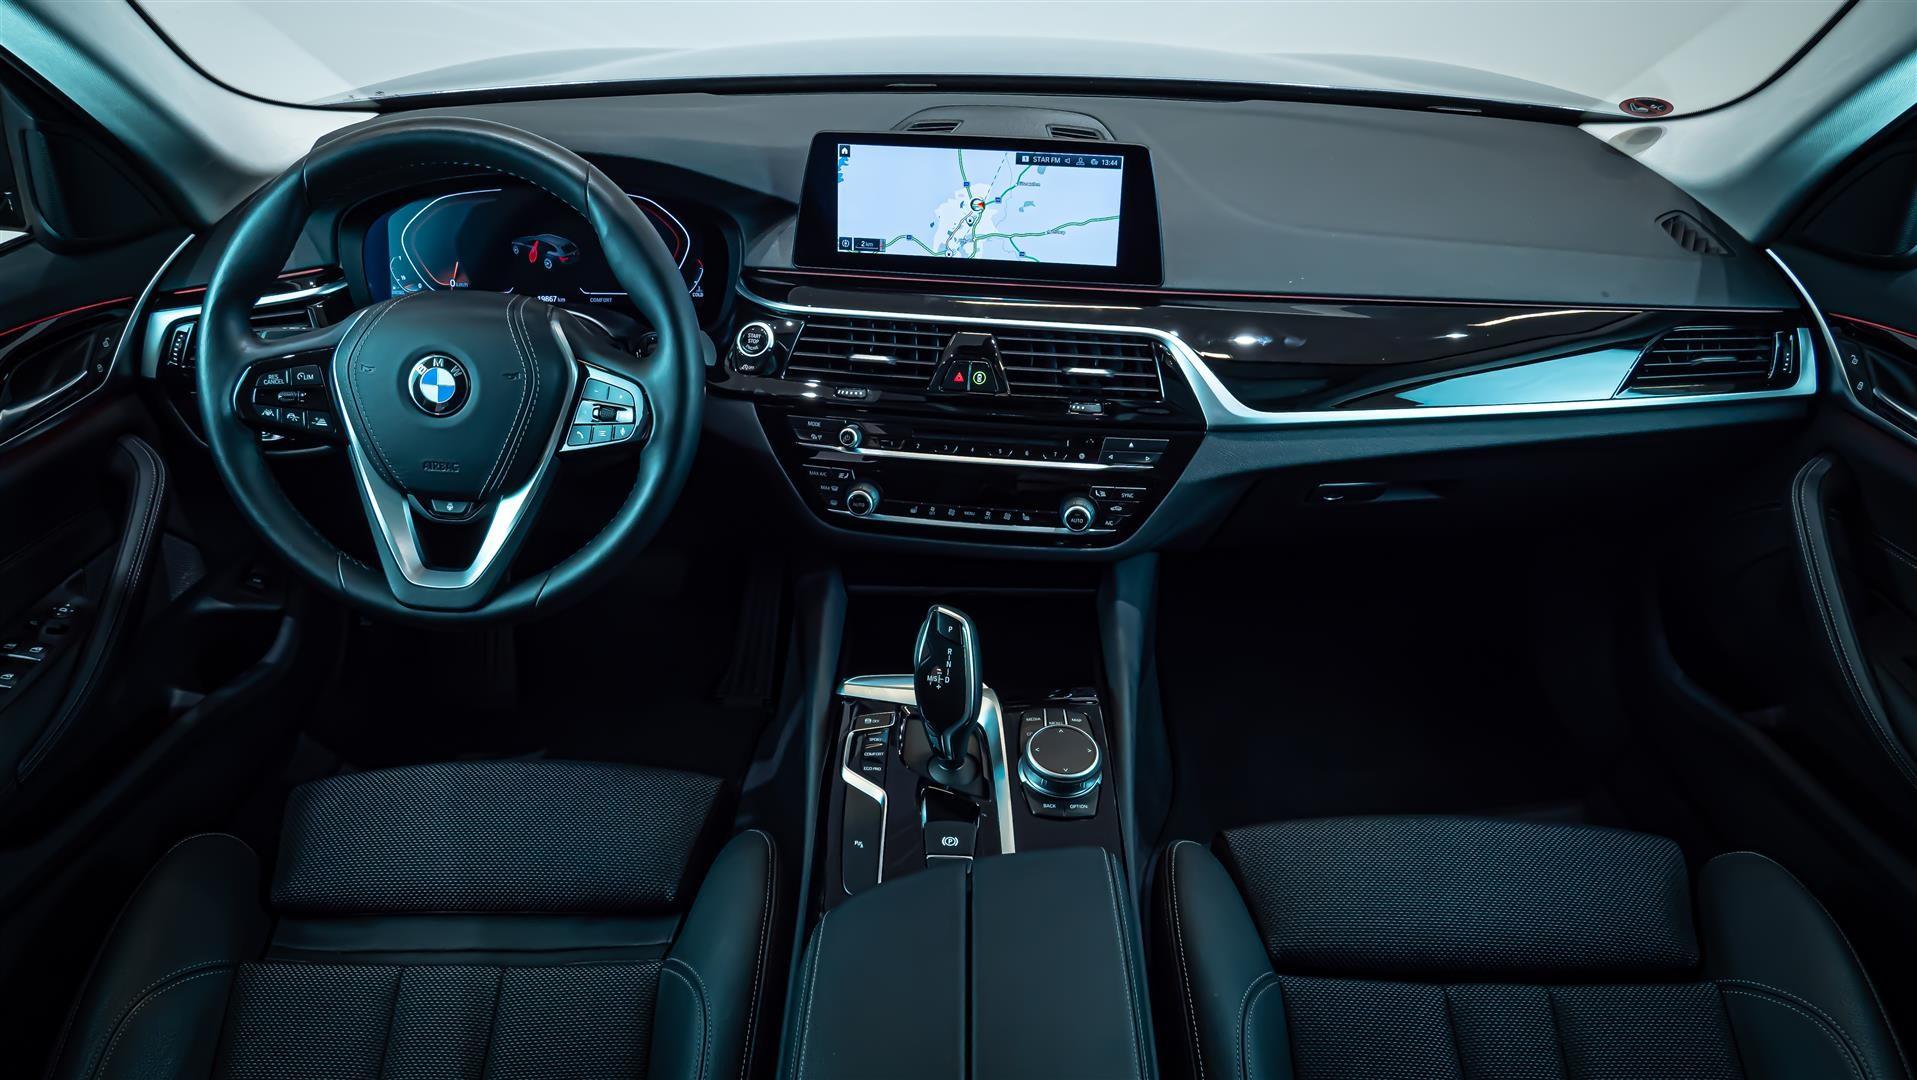 BMW 520d xDrive Touring Navi Värmare Driving Assistant Plus Drag_10